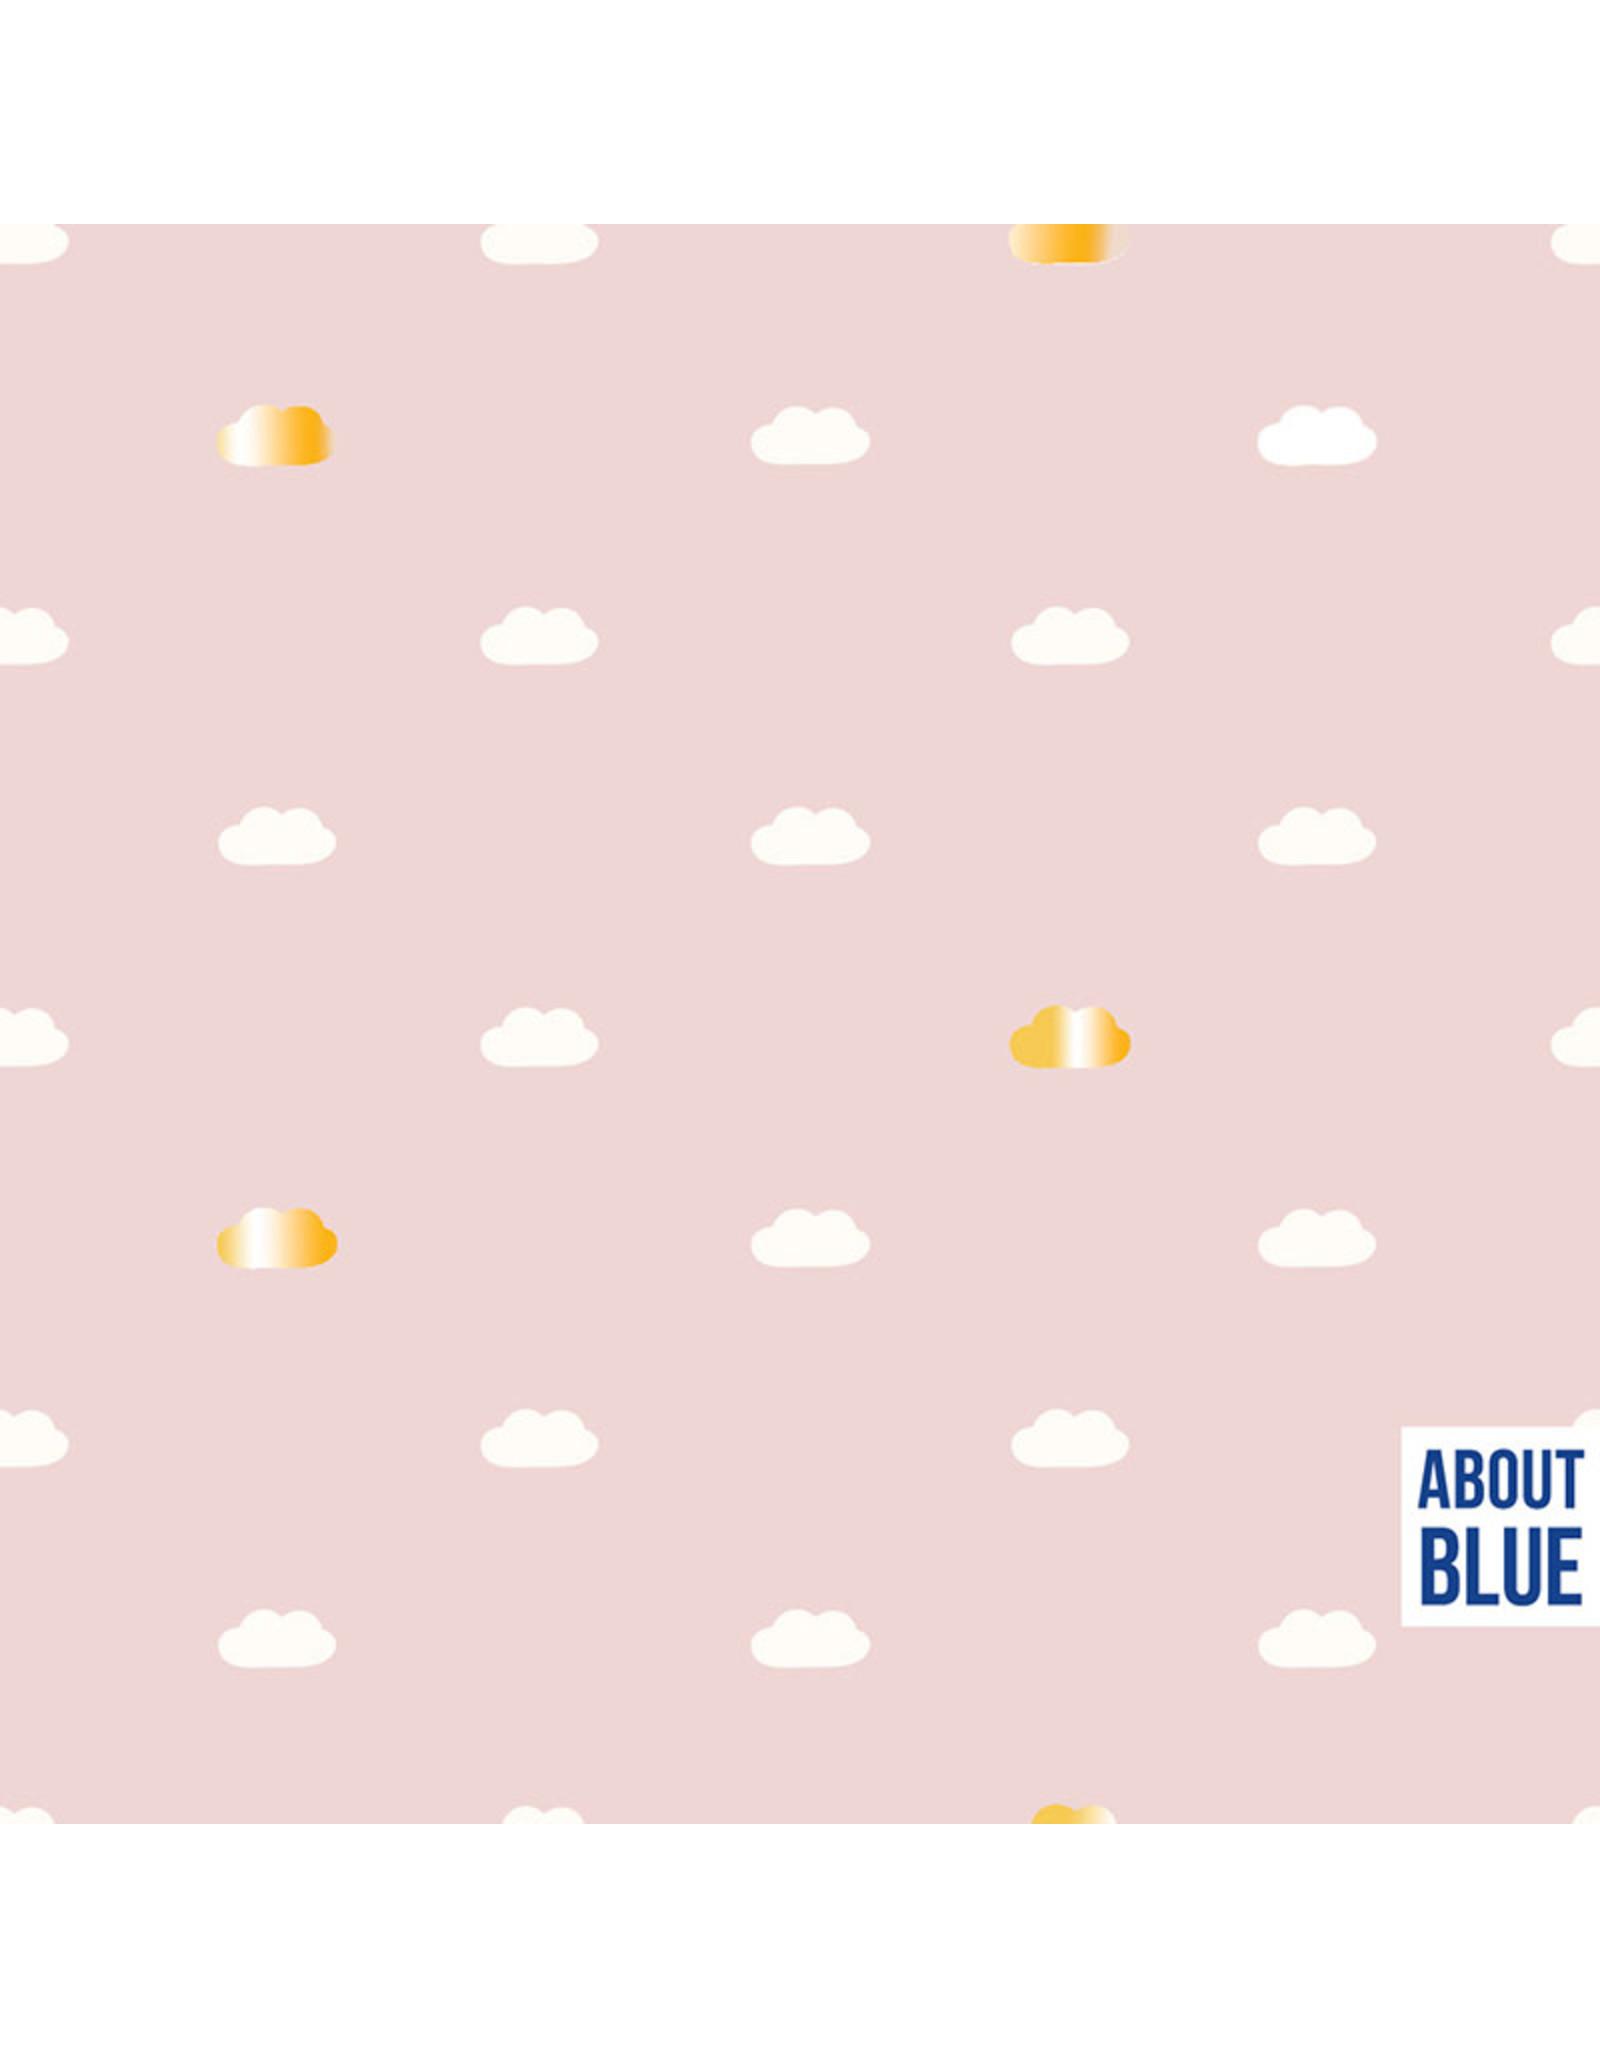 About Blue Fabrics nighty night